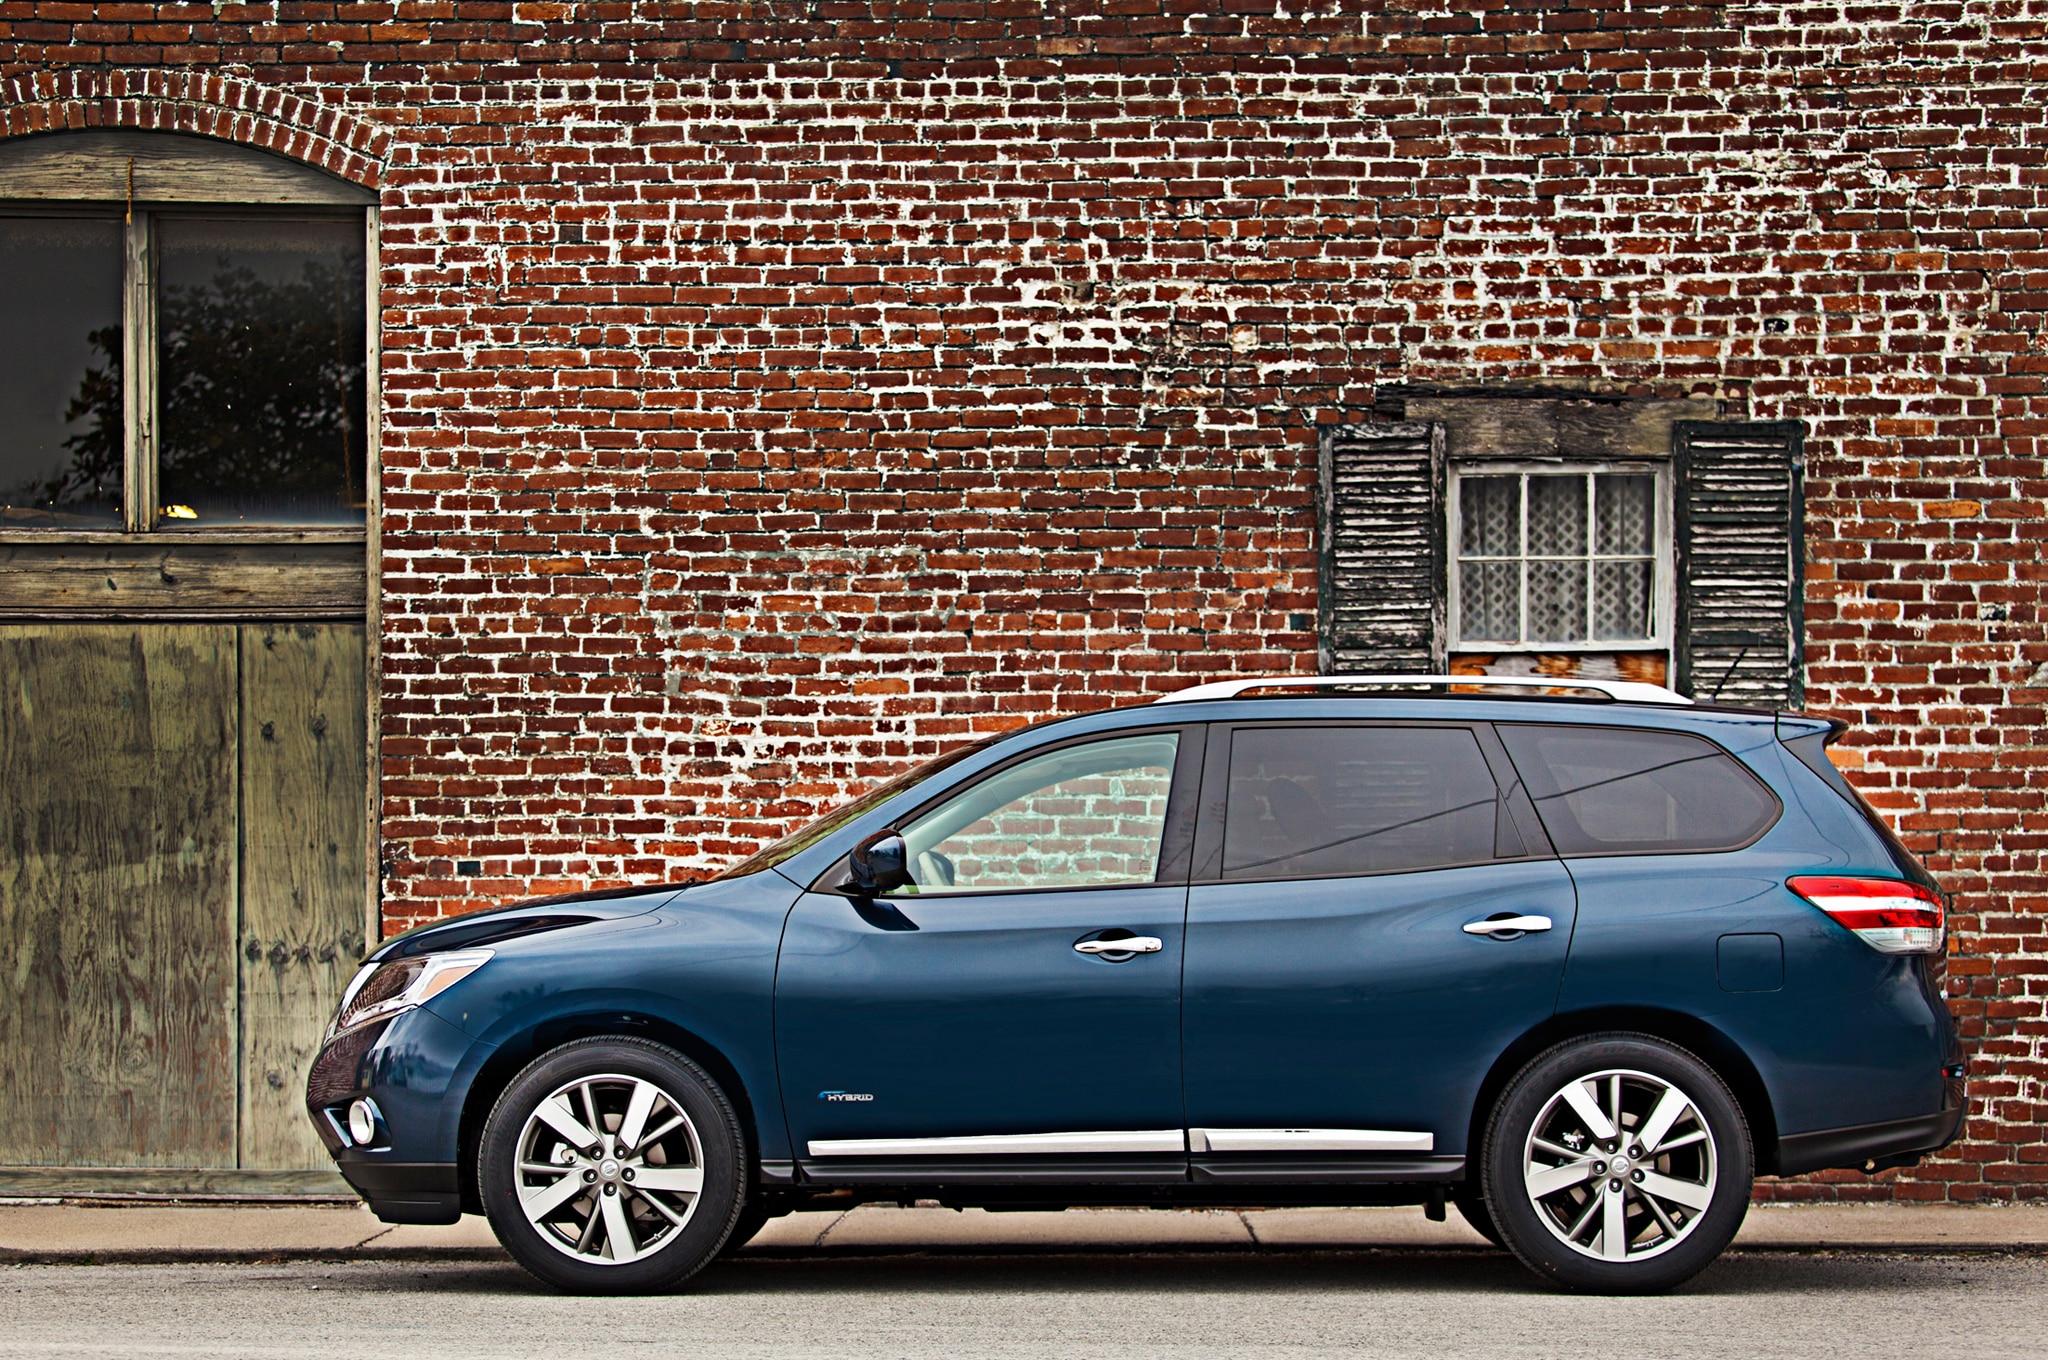 2014 Nissan Pathfinder Hybrid Profile1